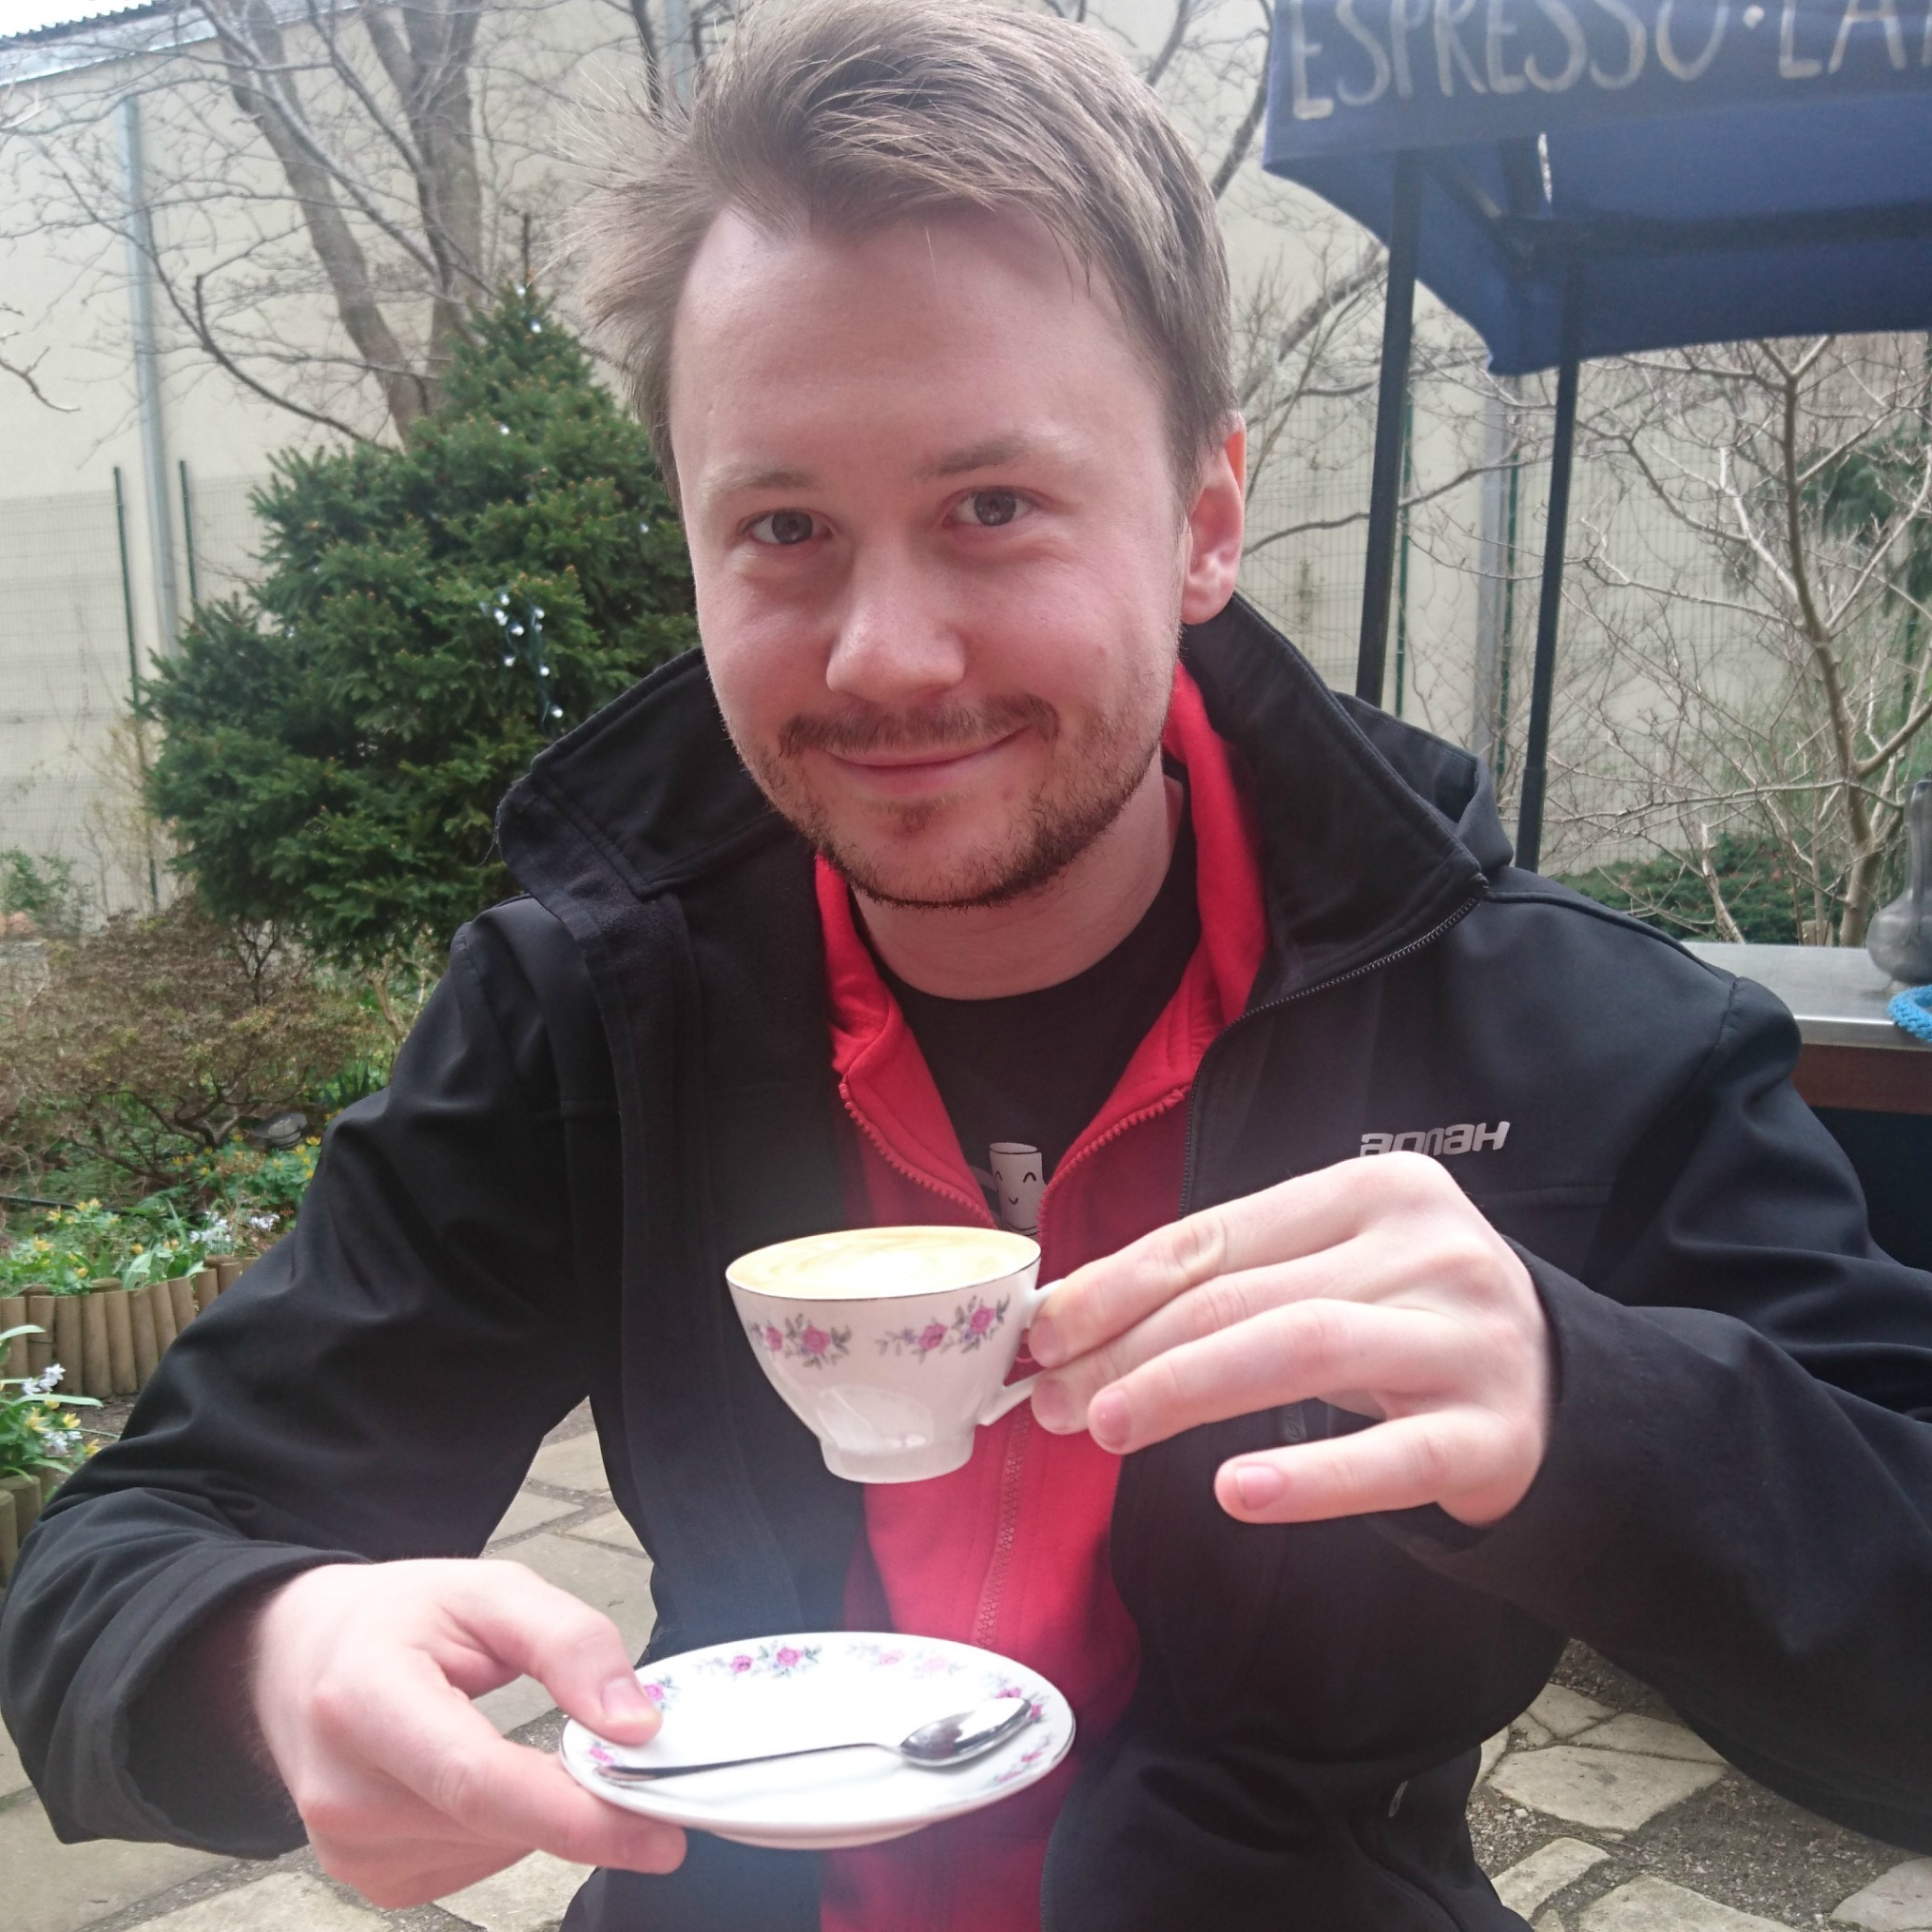 Lukas drinking a coffee in Prague